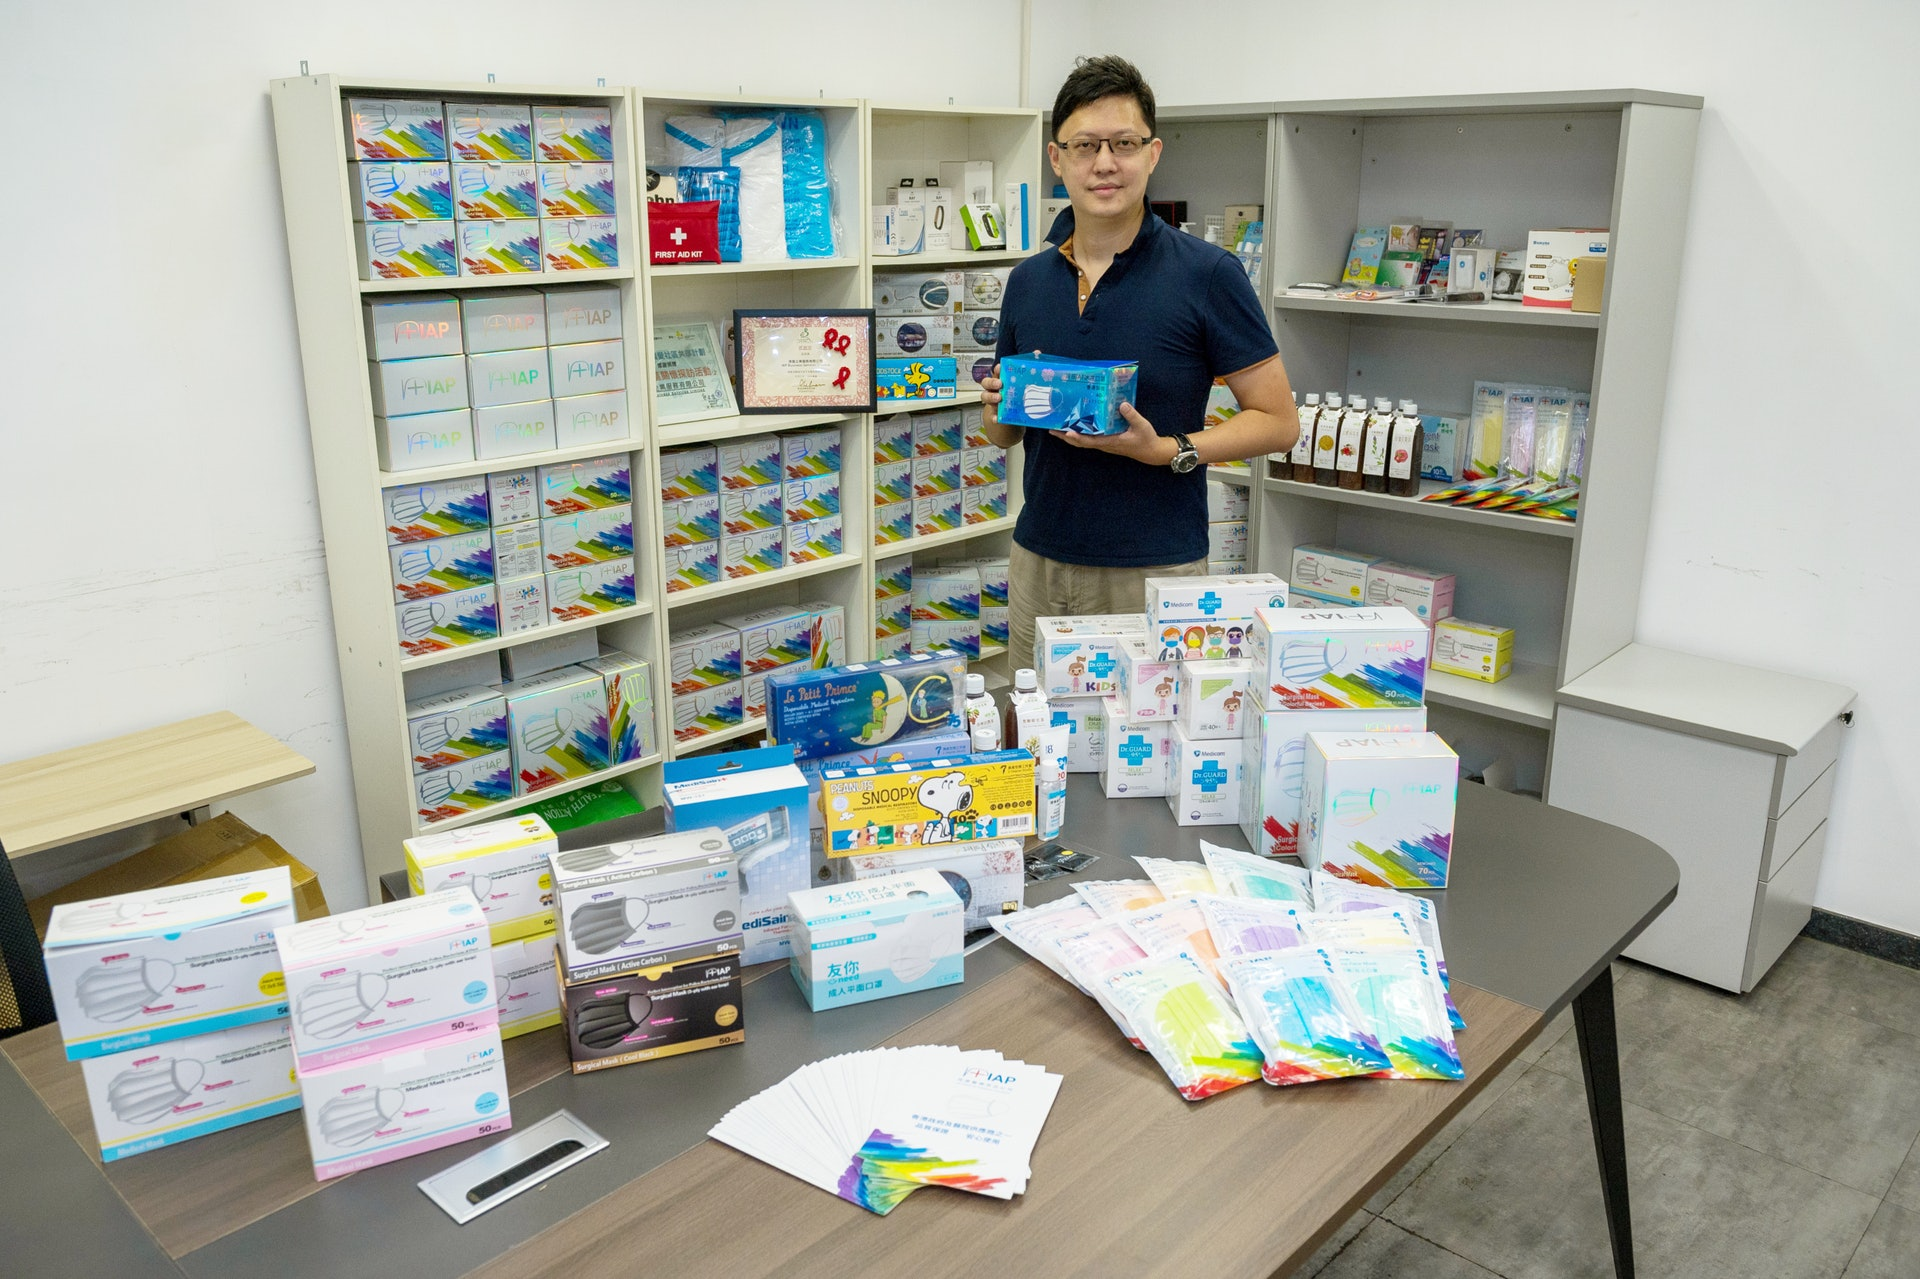 IAP醫院管理局及多間公、私營機構直接供應口罩和防護產品,服務香港超過14年,品質具保證。(圖片:醫師Easy拍攝)